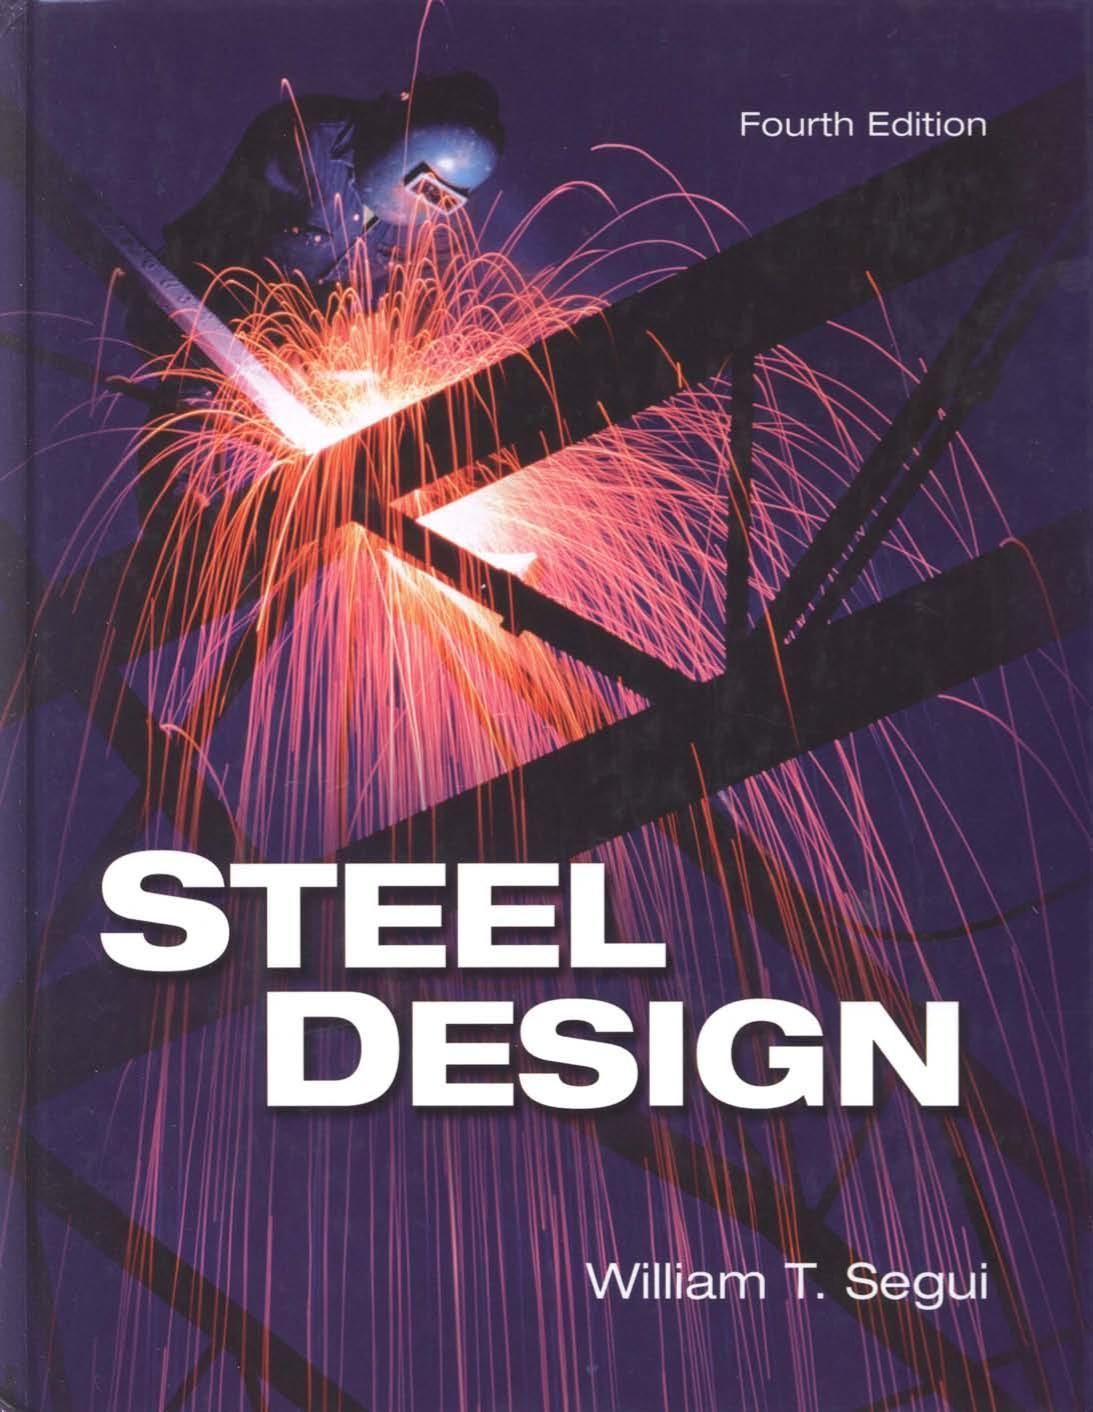 Steel Design Fourth Edition In 2021 Steel Design Engineering Student Books